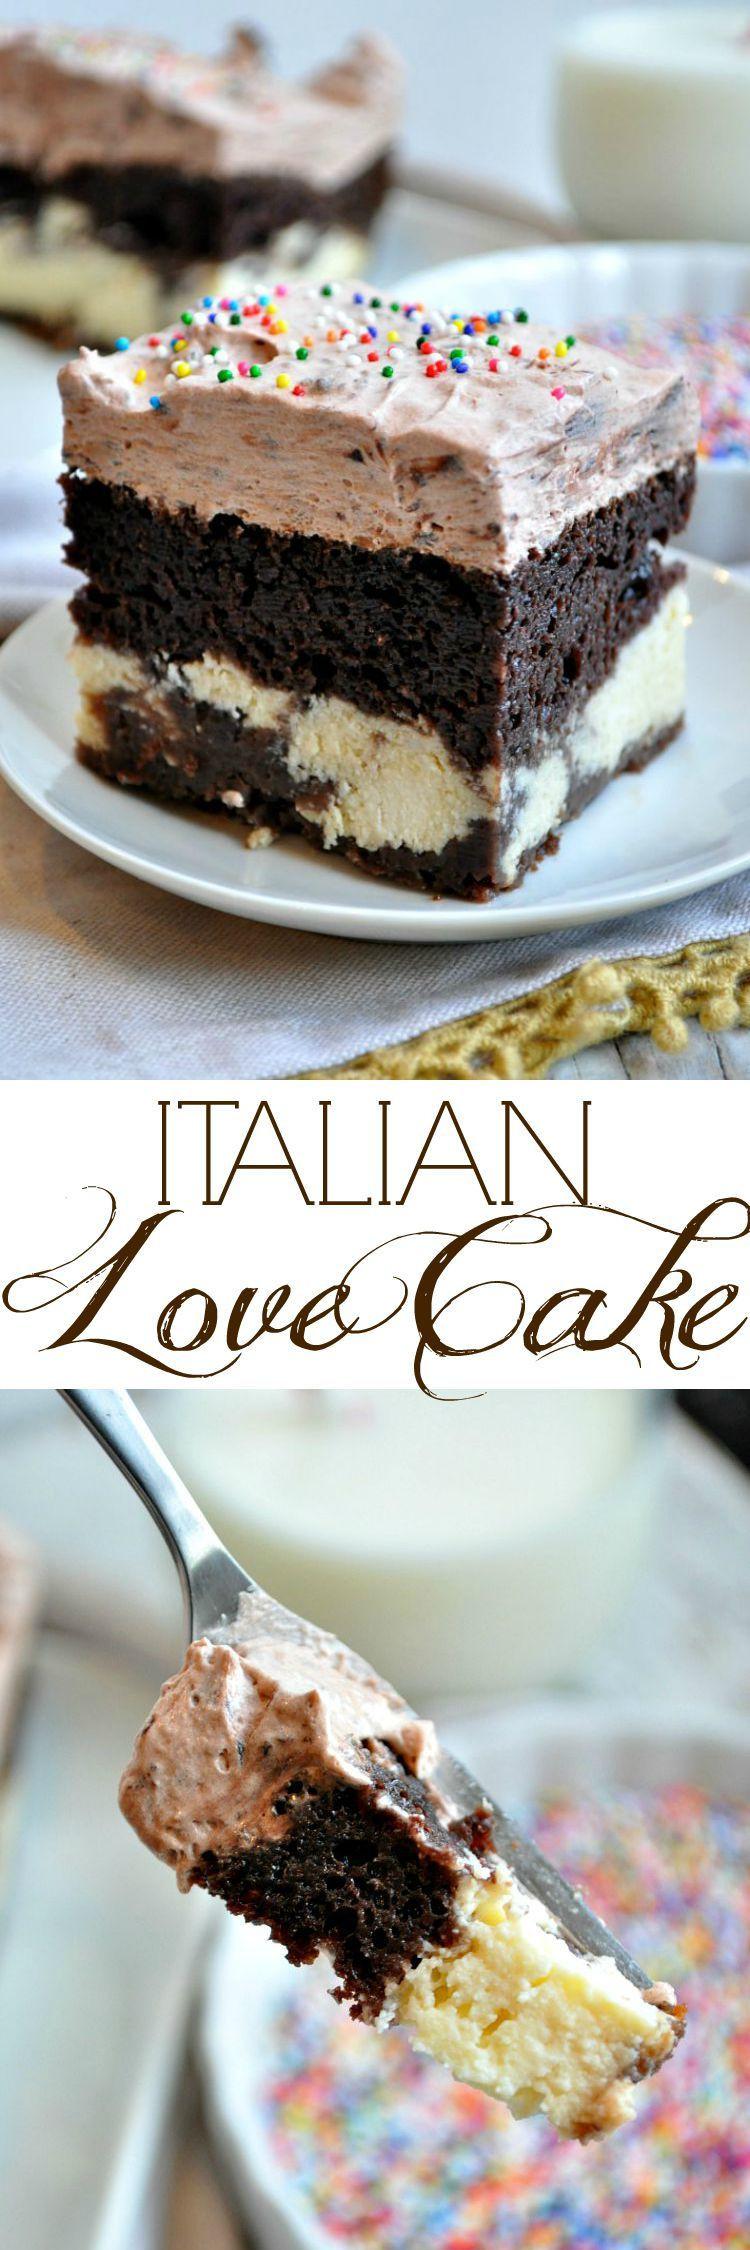 Easy Chocolate Desserts  Easy Chocolate Italian Love Cake Recipe